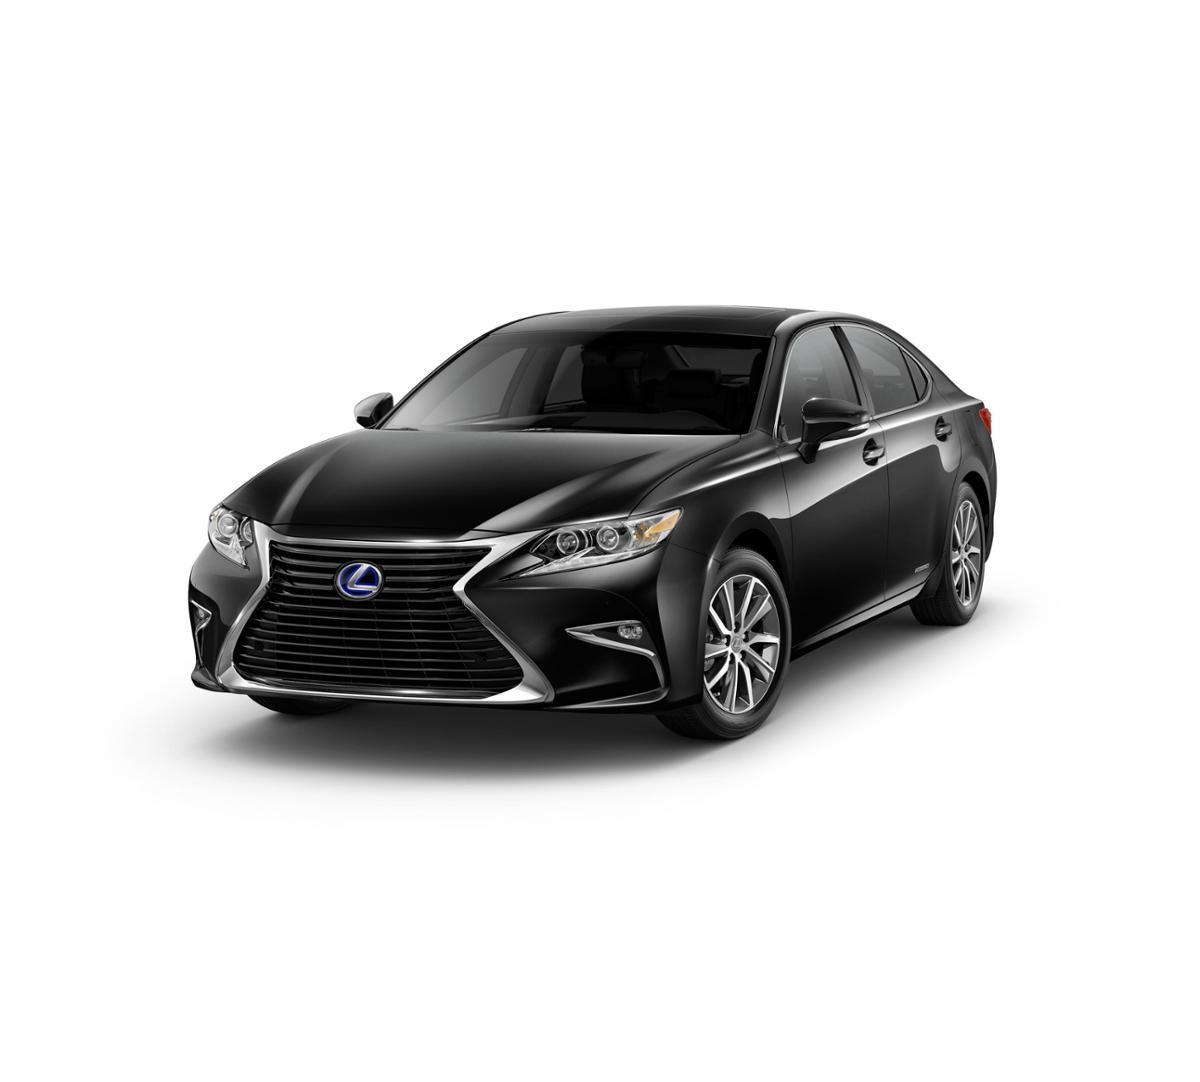 2018 lexus es 300h for sale in westmont for Toyota motor credit corporation atlanta